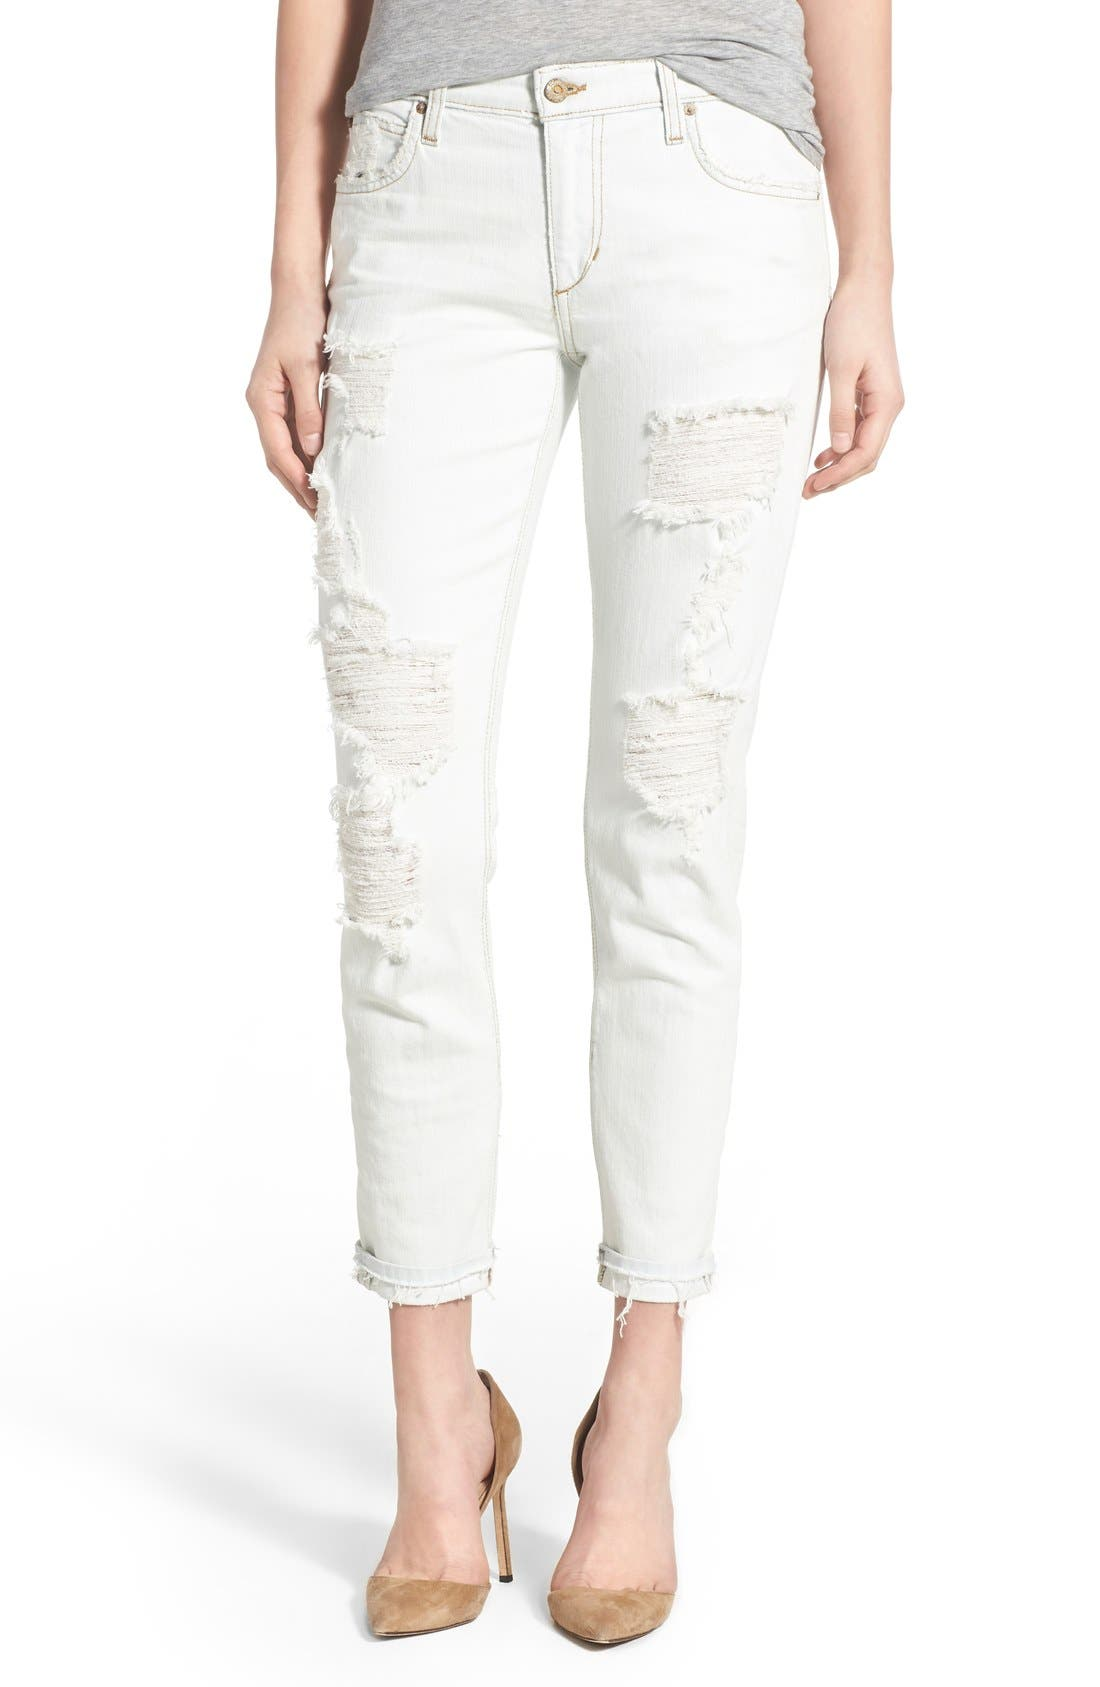 Alternate Image 1 Selected - Joe's 'Collector's - Billie' Ankle Slim Boyfriend Jeans (Cori)